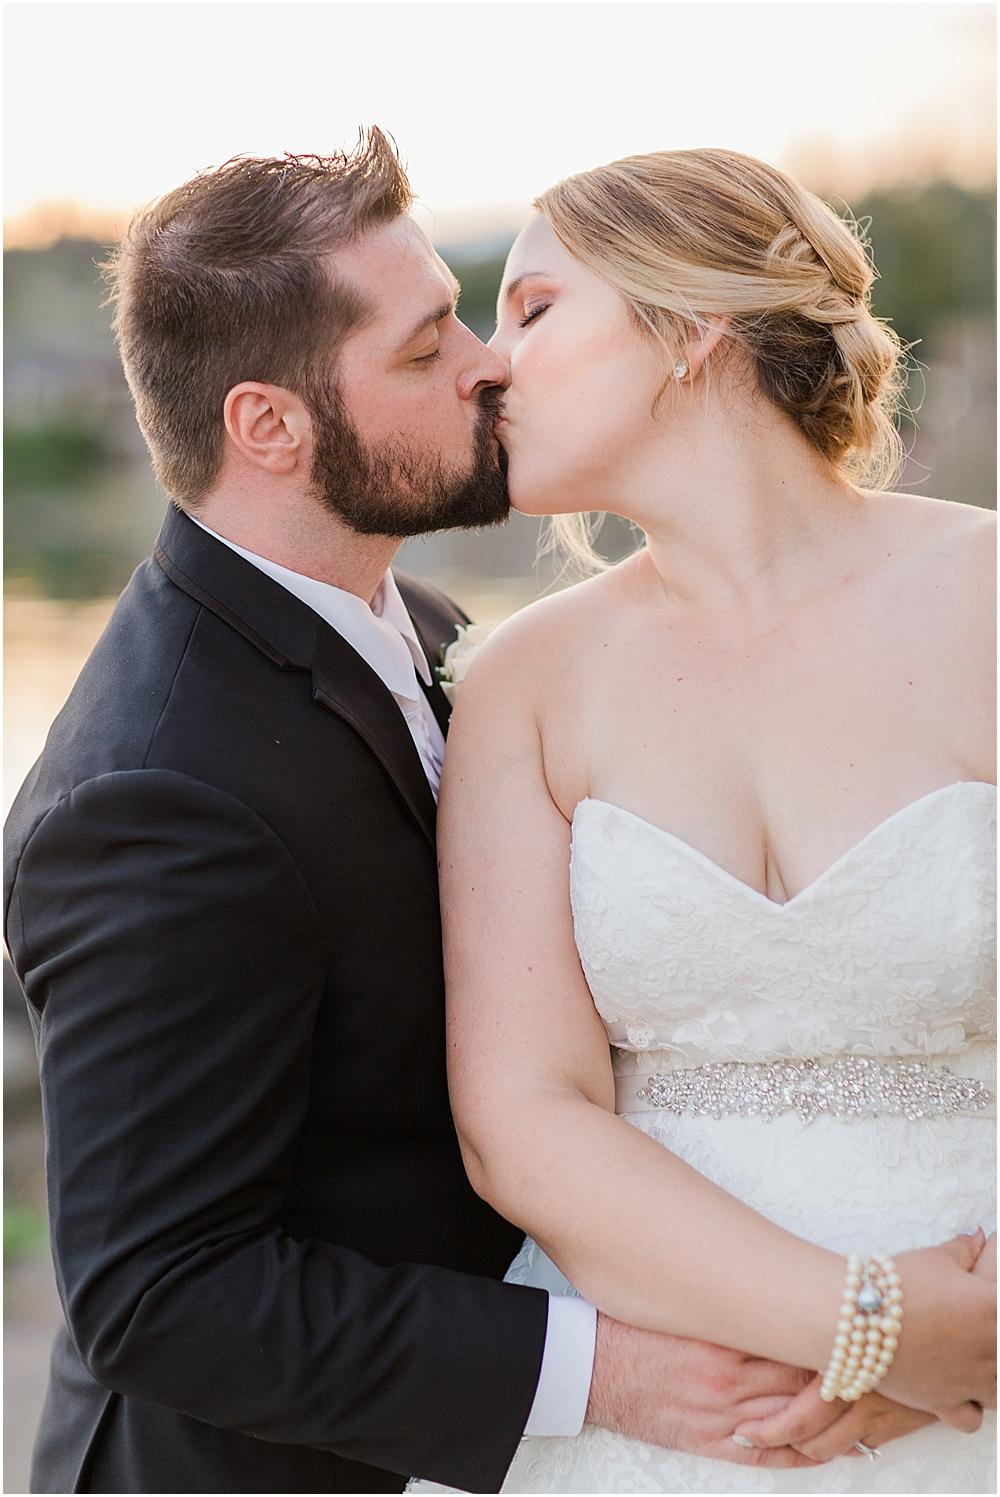 mitzner_silverdale_beach_hotel_wedding_silverdale_washington_pacific_northwest_wedding_photographer_0088